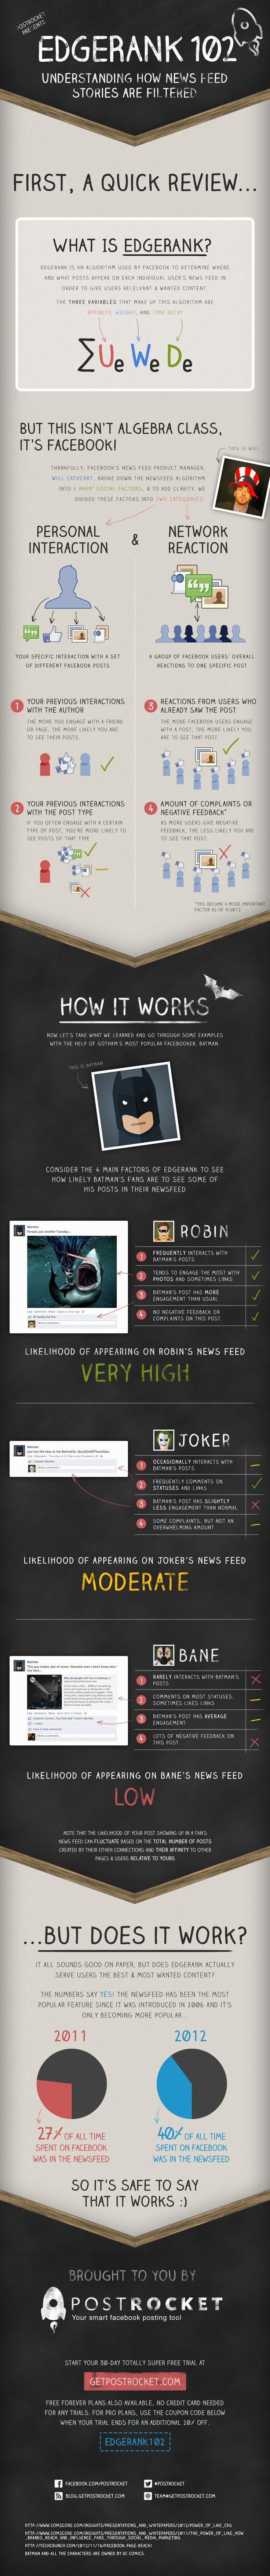 #Facebook #Edgerank